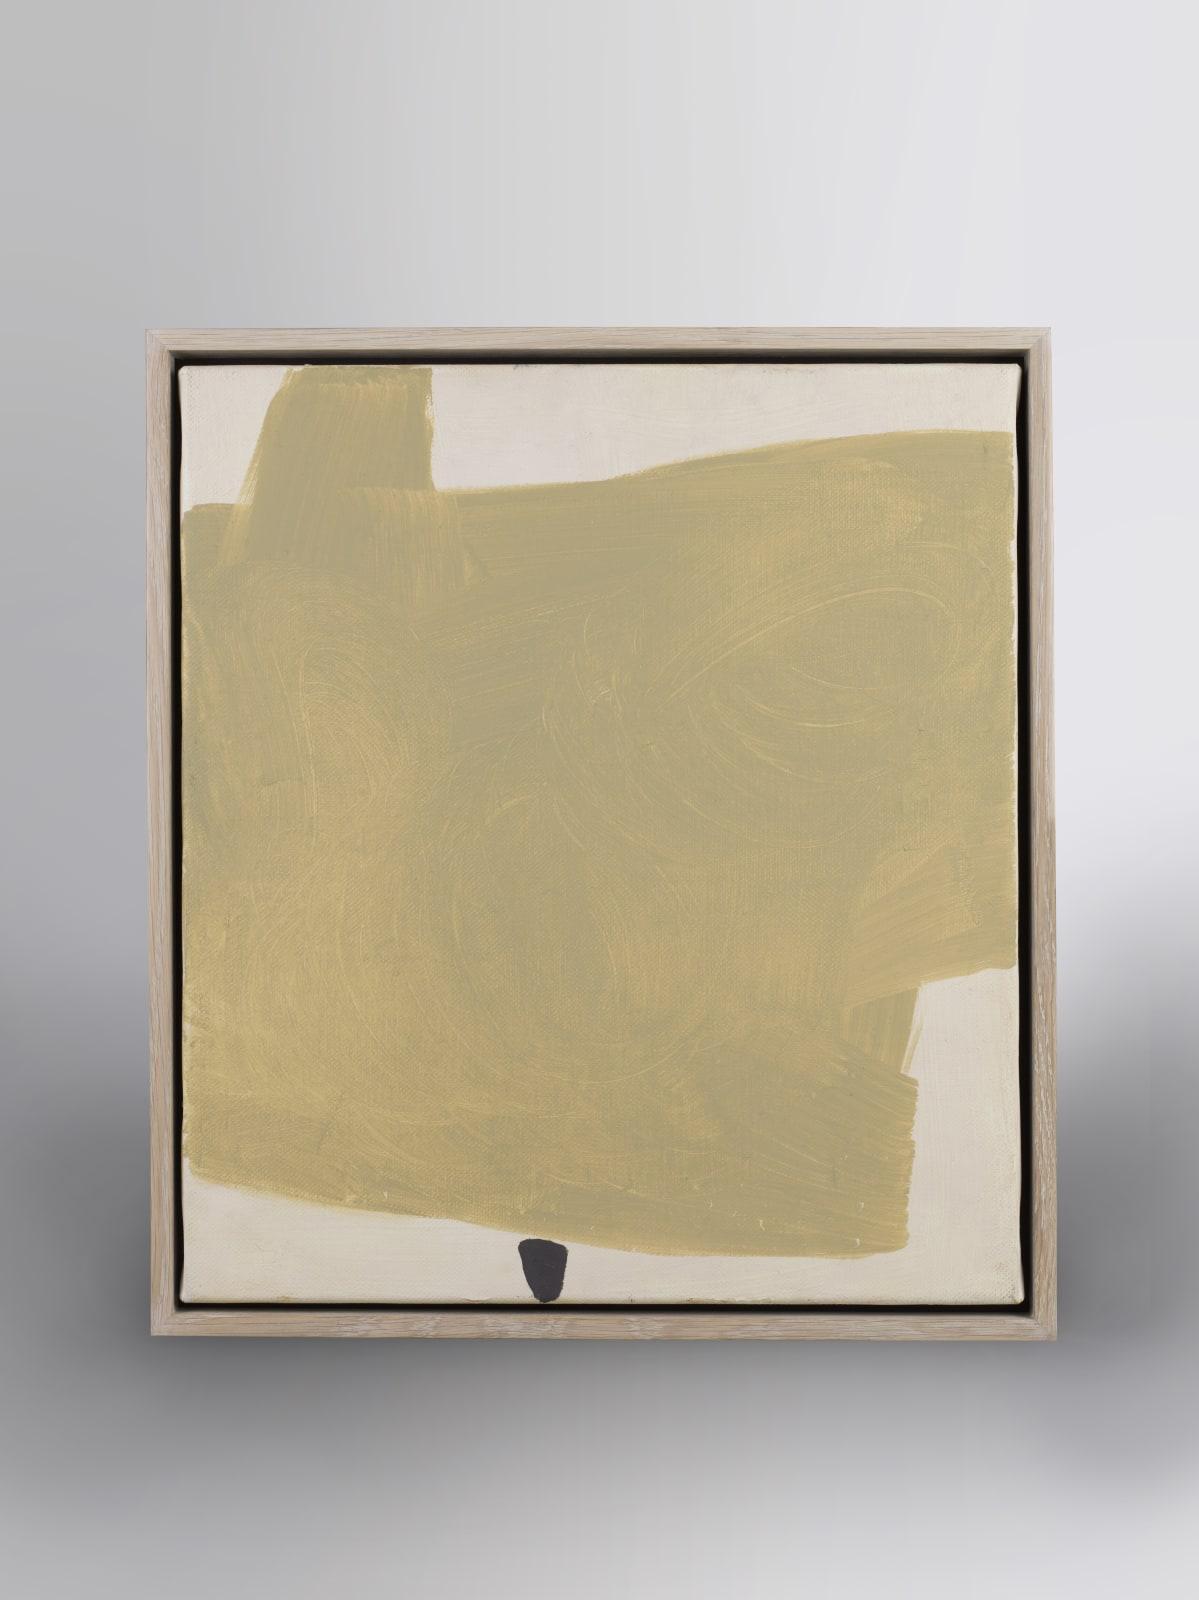 Study for Zen Garden oil on canvas 58cm x 52cm